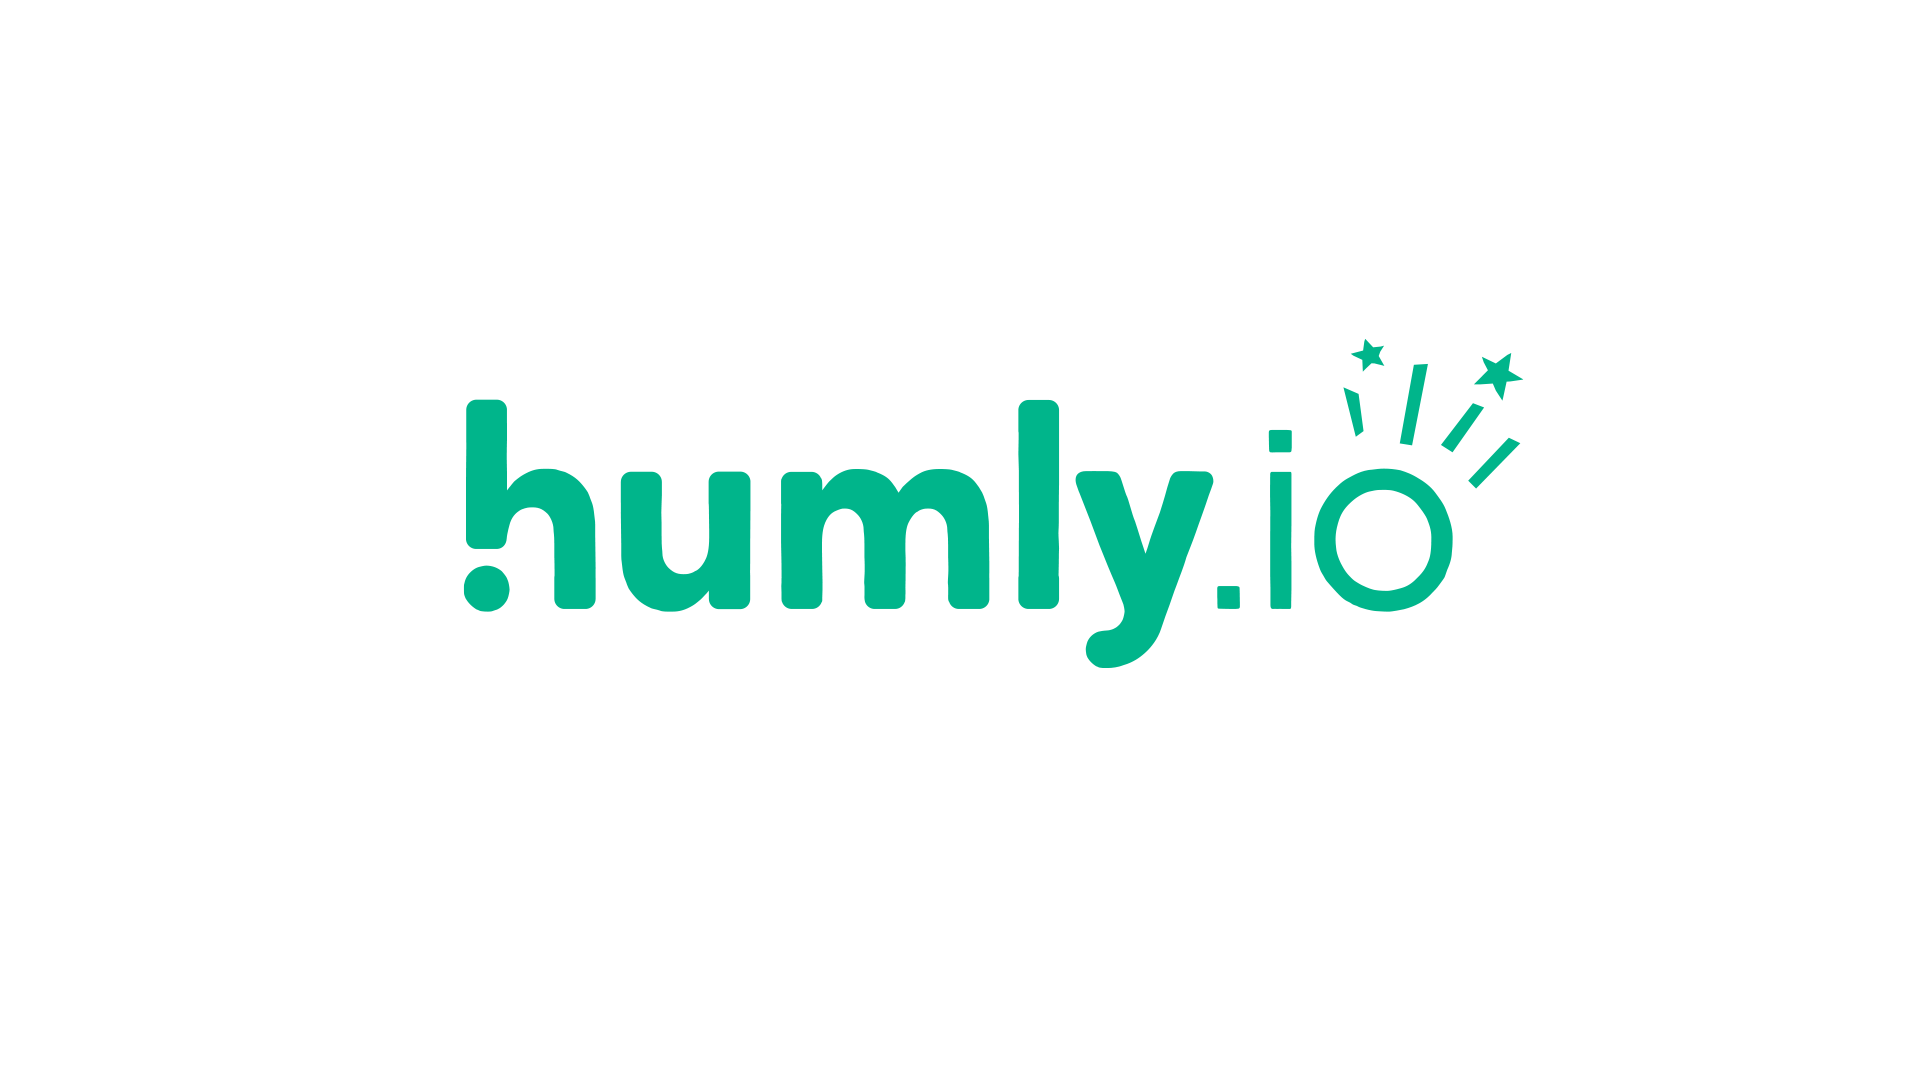 humly_logo_io_1920x1080